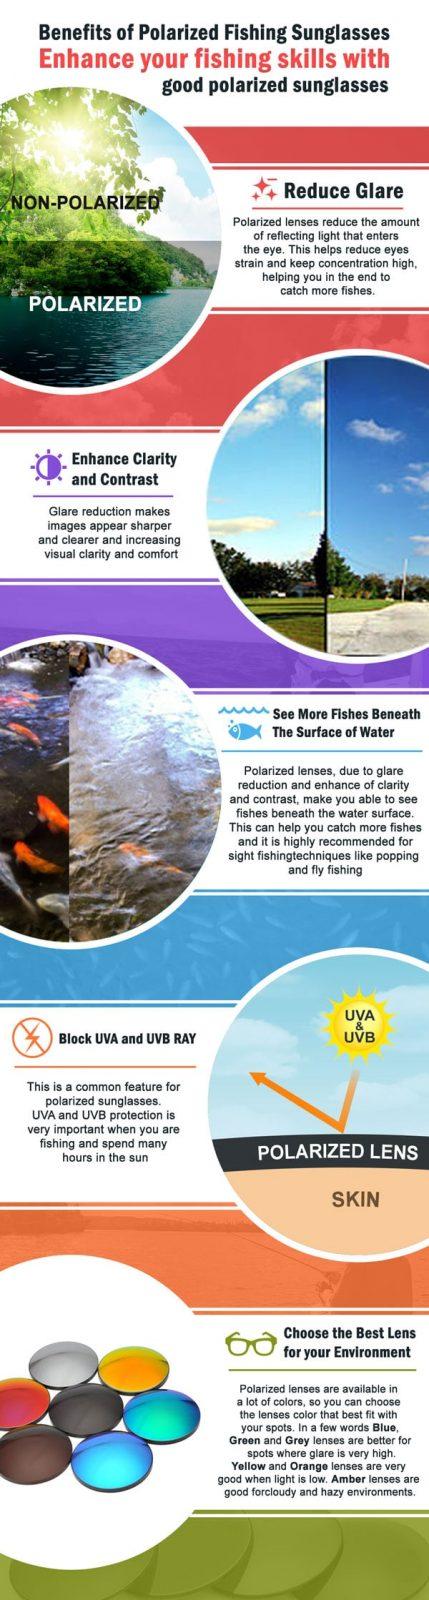 benefits-of-fishing-sunglasses-infographic